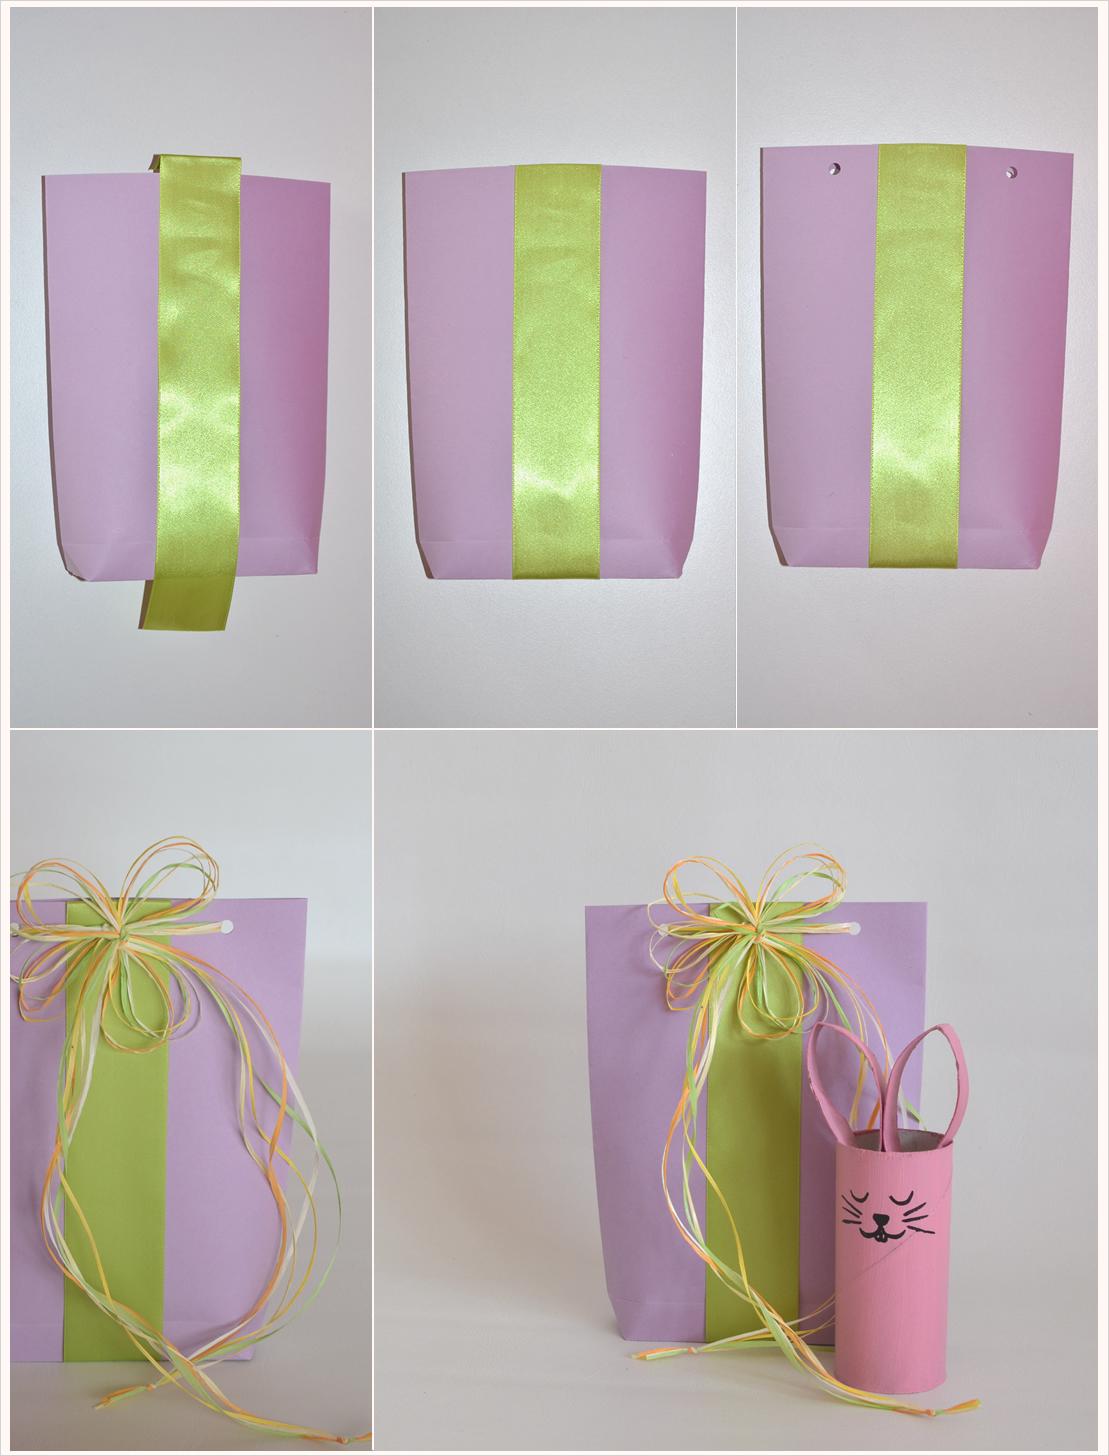 Oster-Geschenke verpacken Teil 4: Papiertüte mal anders